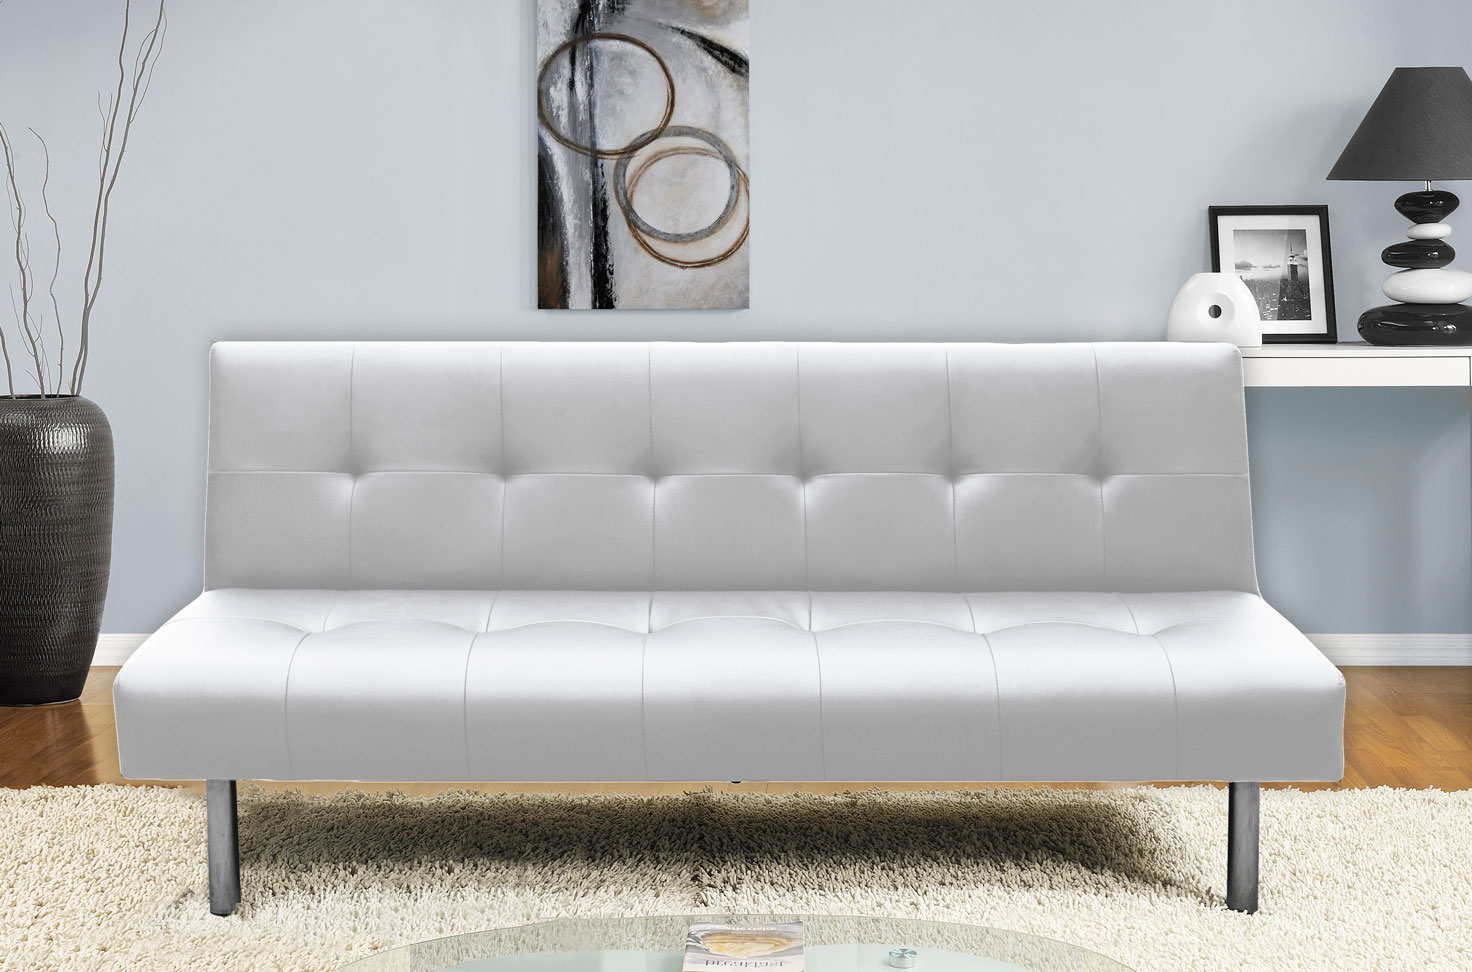 sofa cama plegable multifuncional upholstery fabric singapore sofá delhi sofás piel artificial